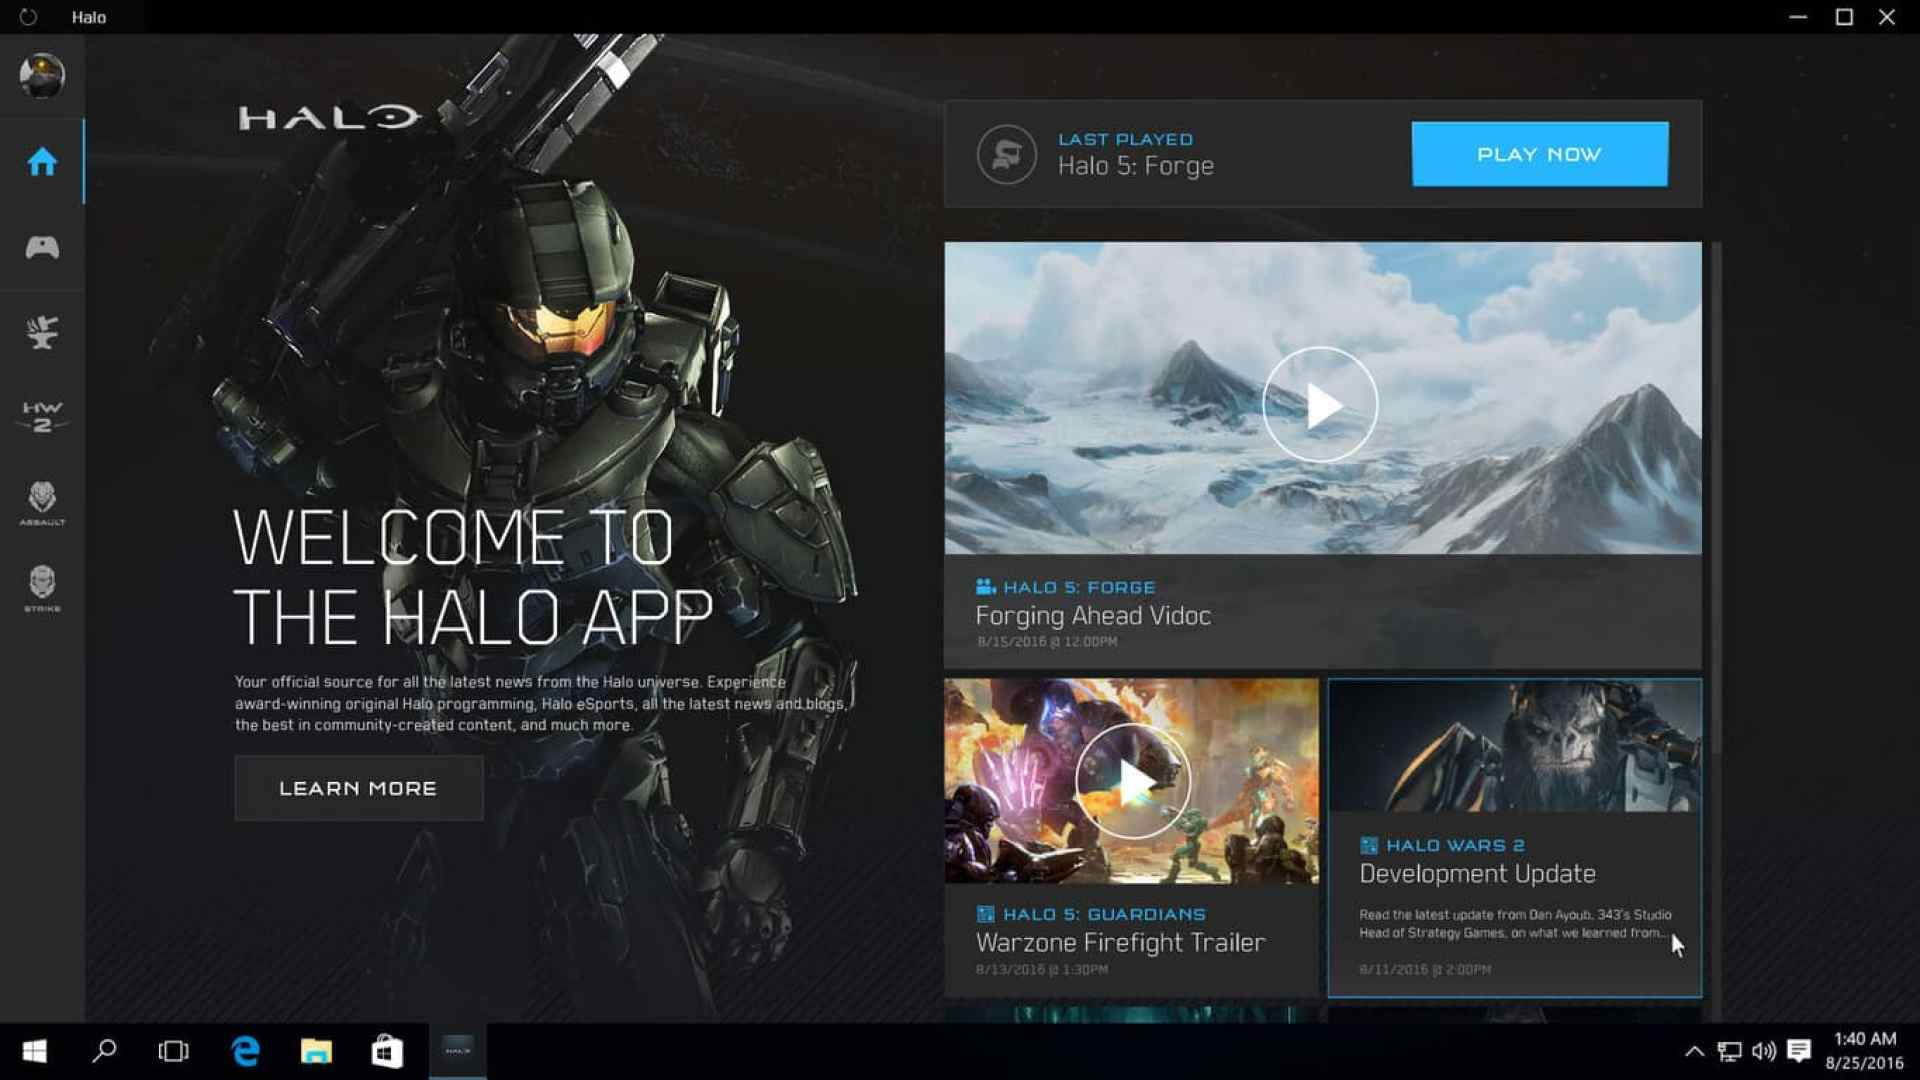 Halo, Windows 10, app